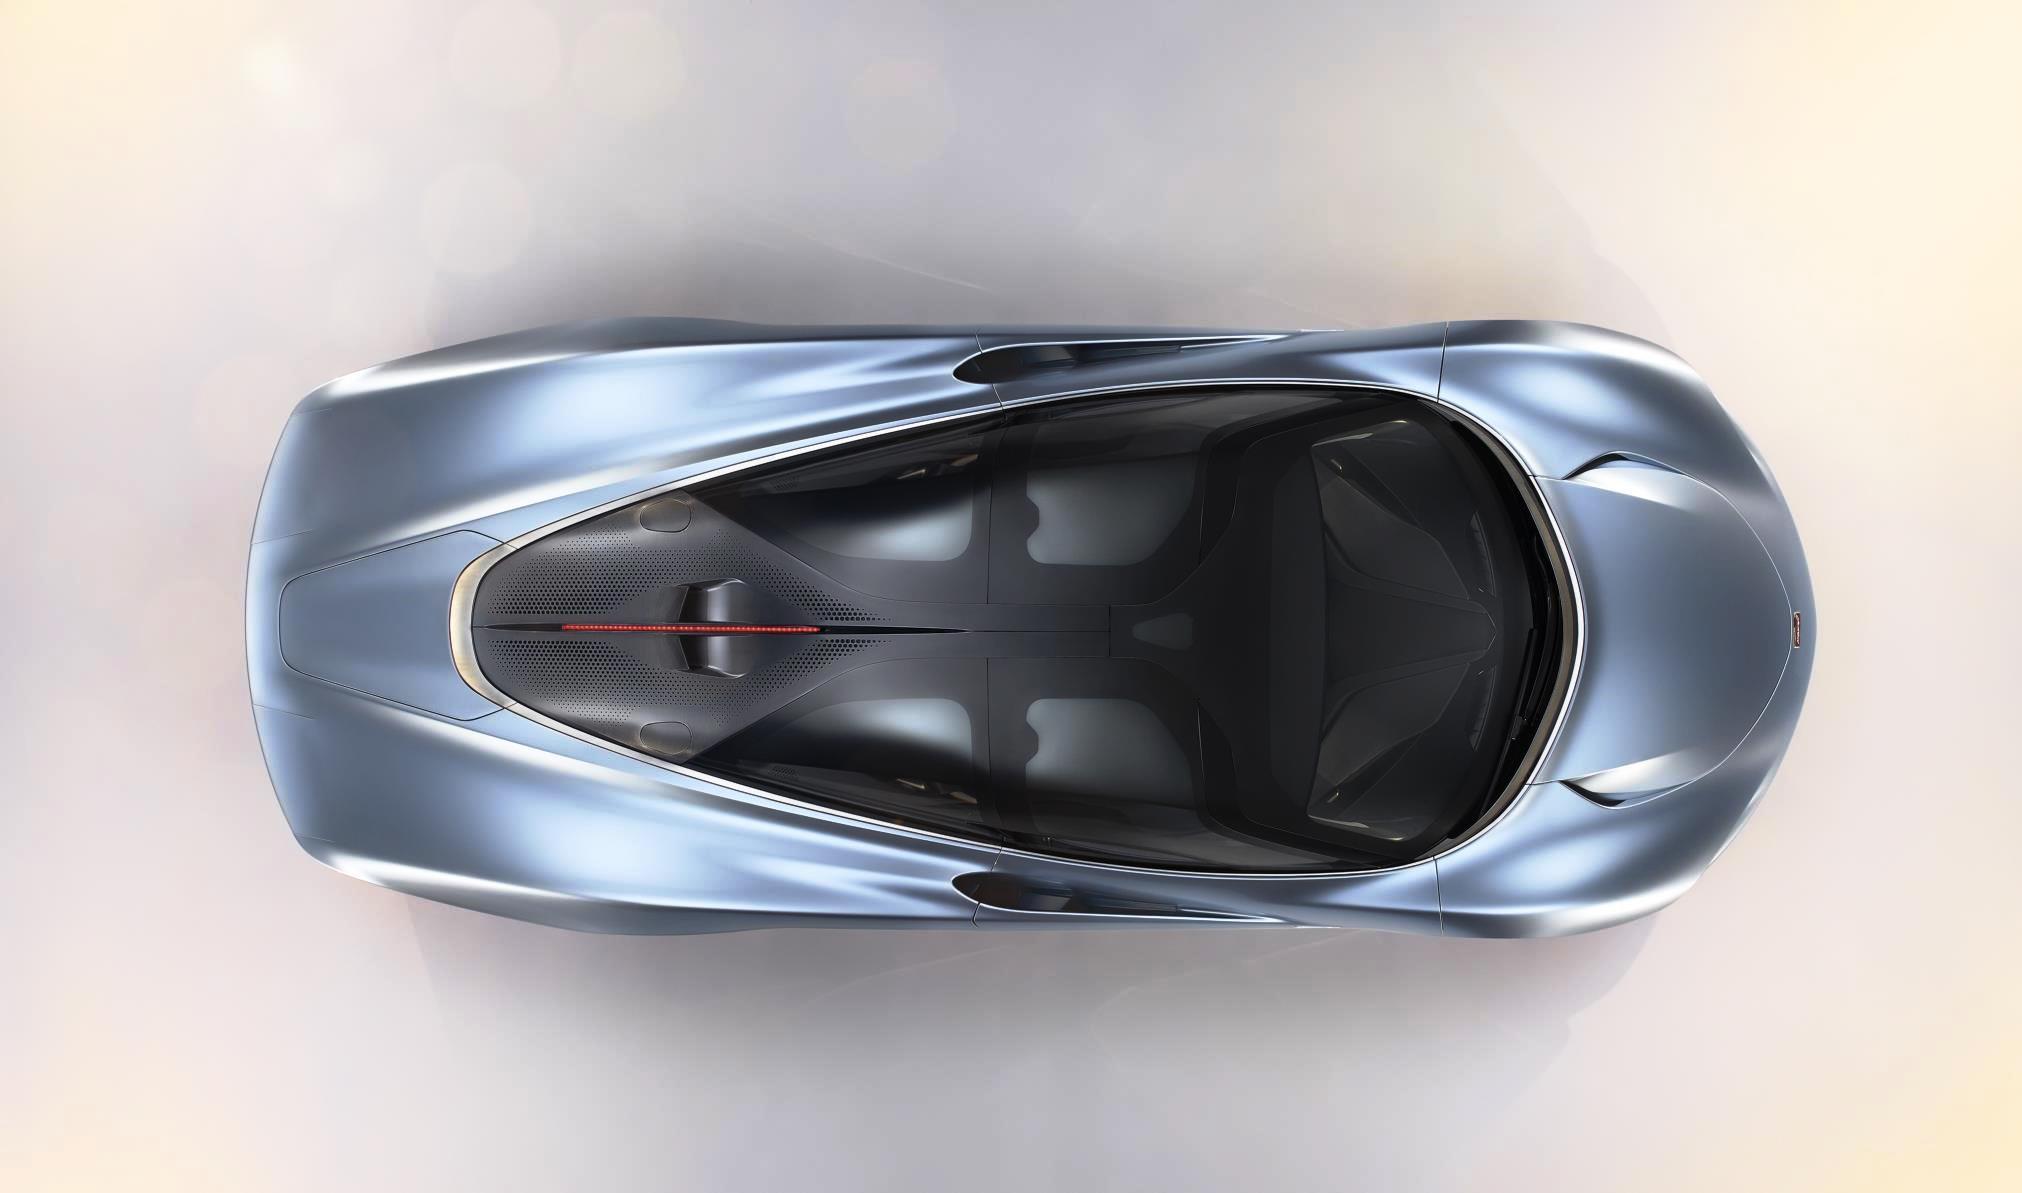 McLaren Speedtail hypercar overhead view